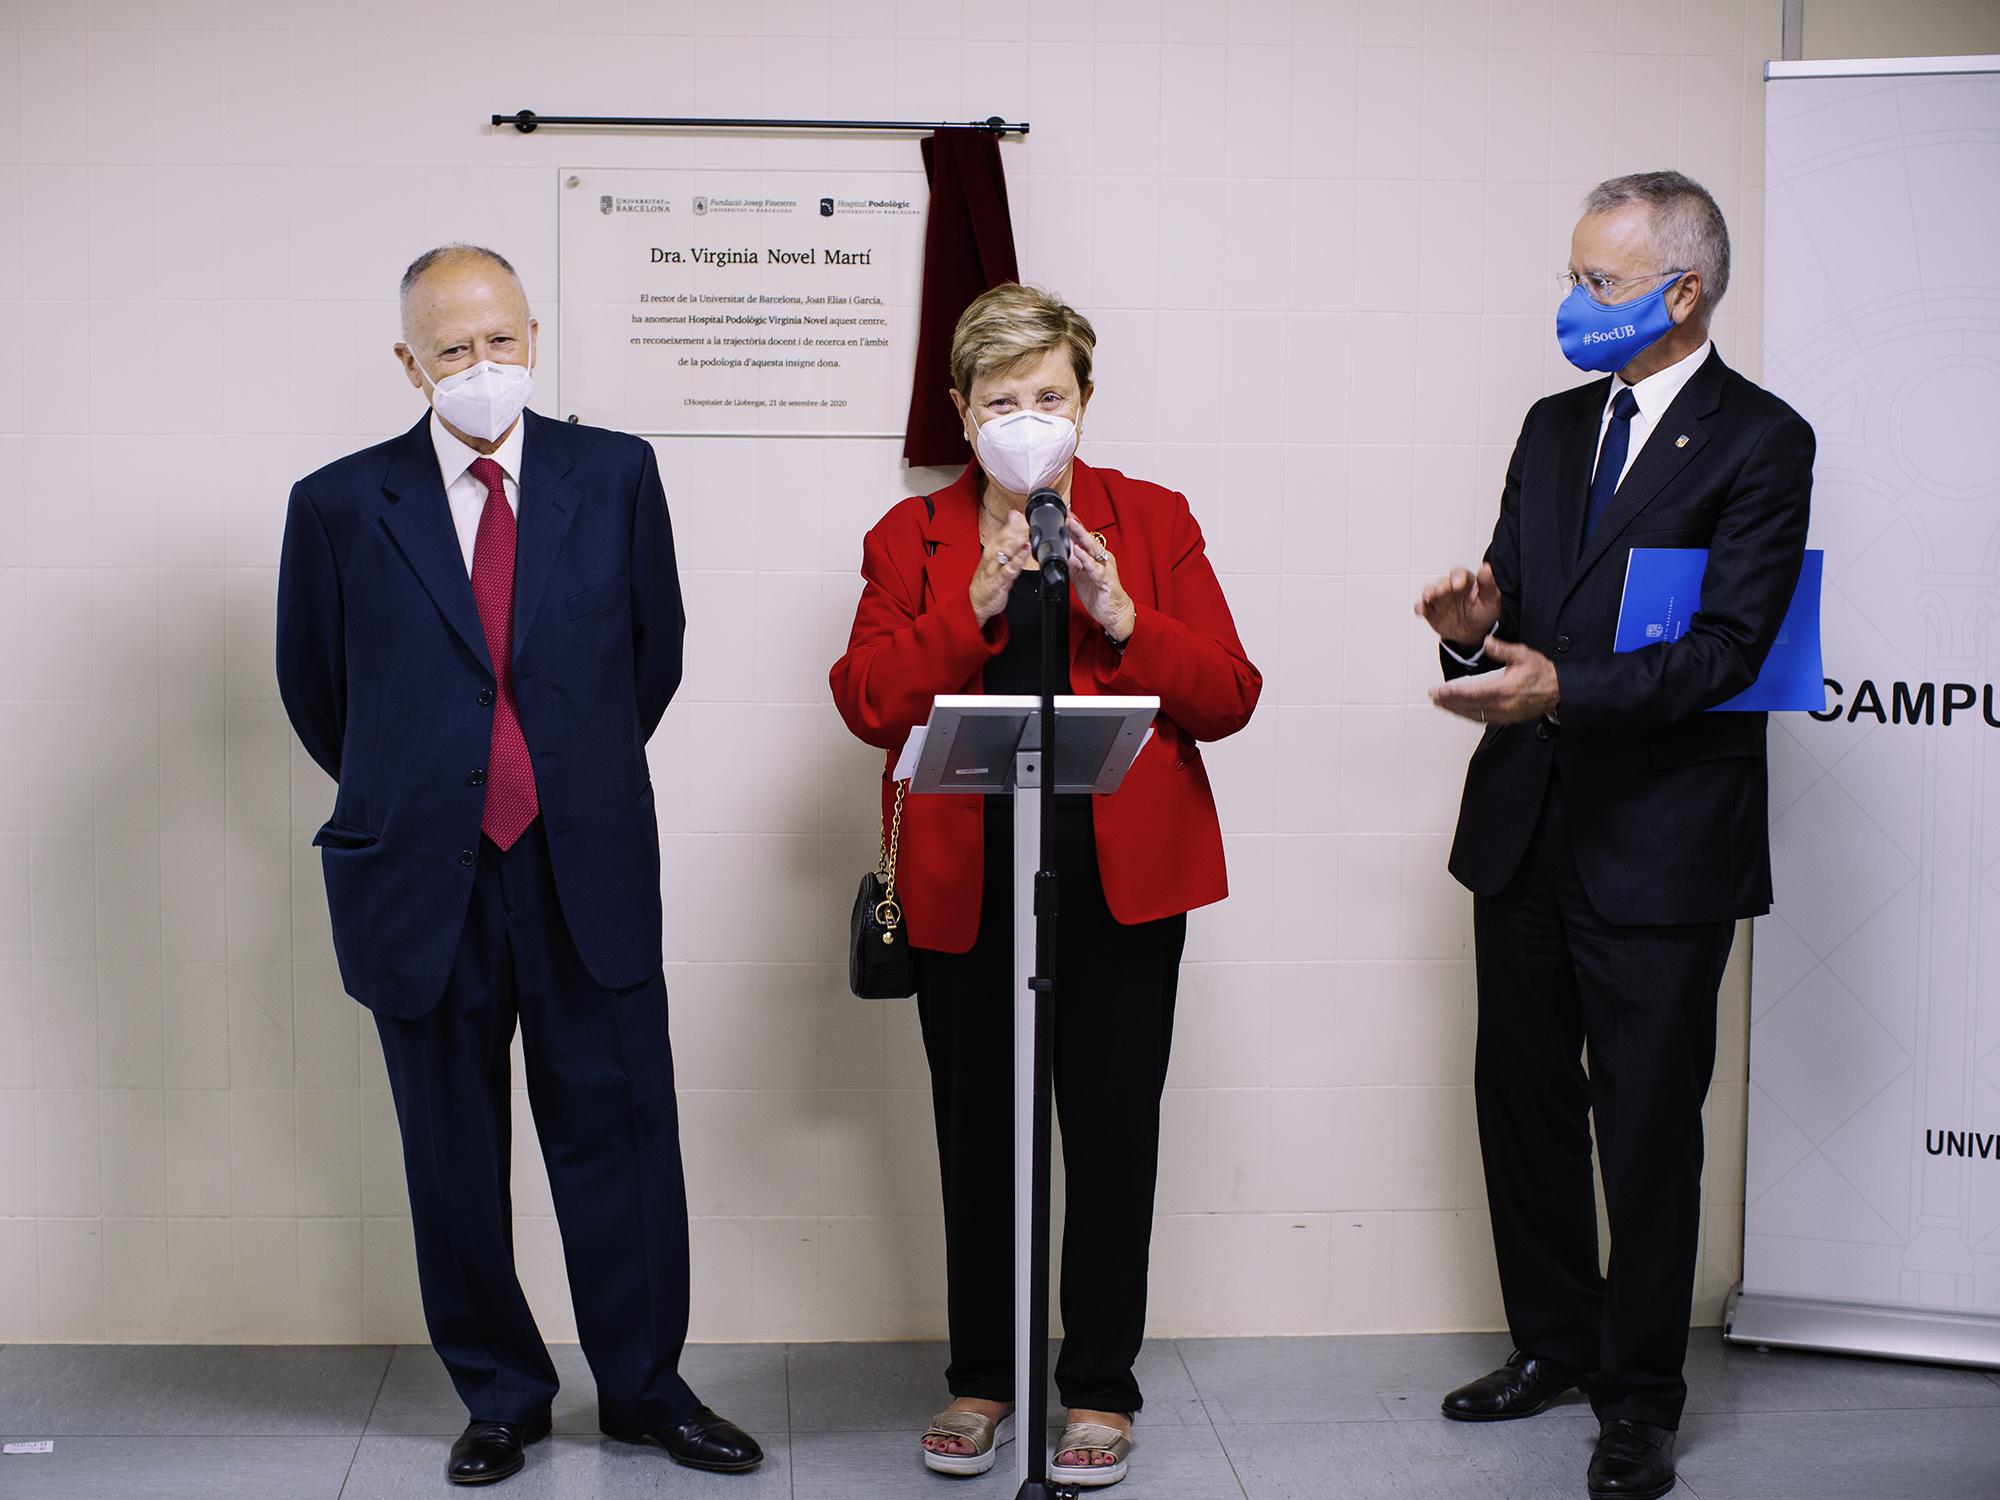 L'Hospital Podològic UB inaugura nou nom; Hospital Podològic Virginia Novel